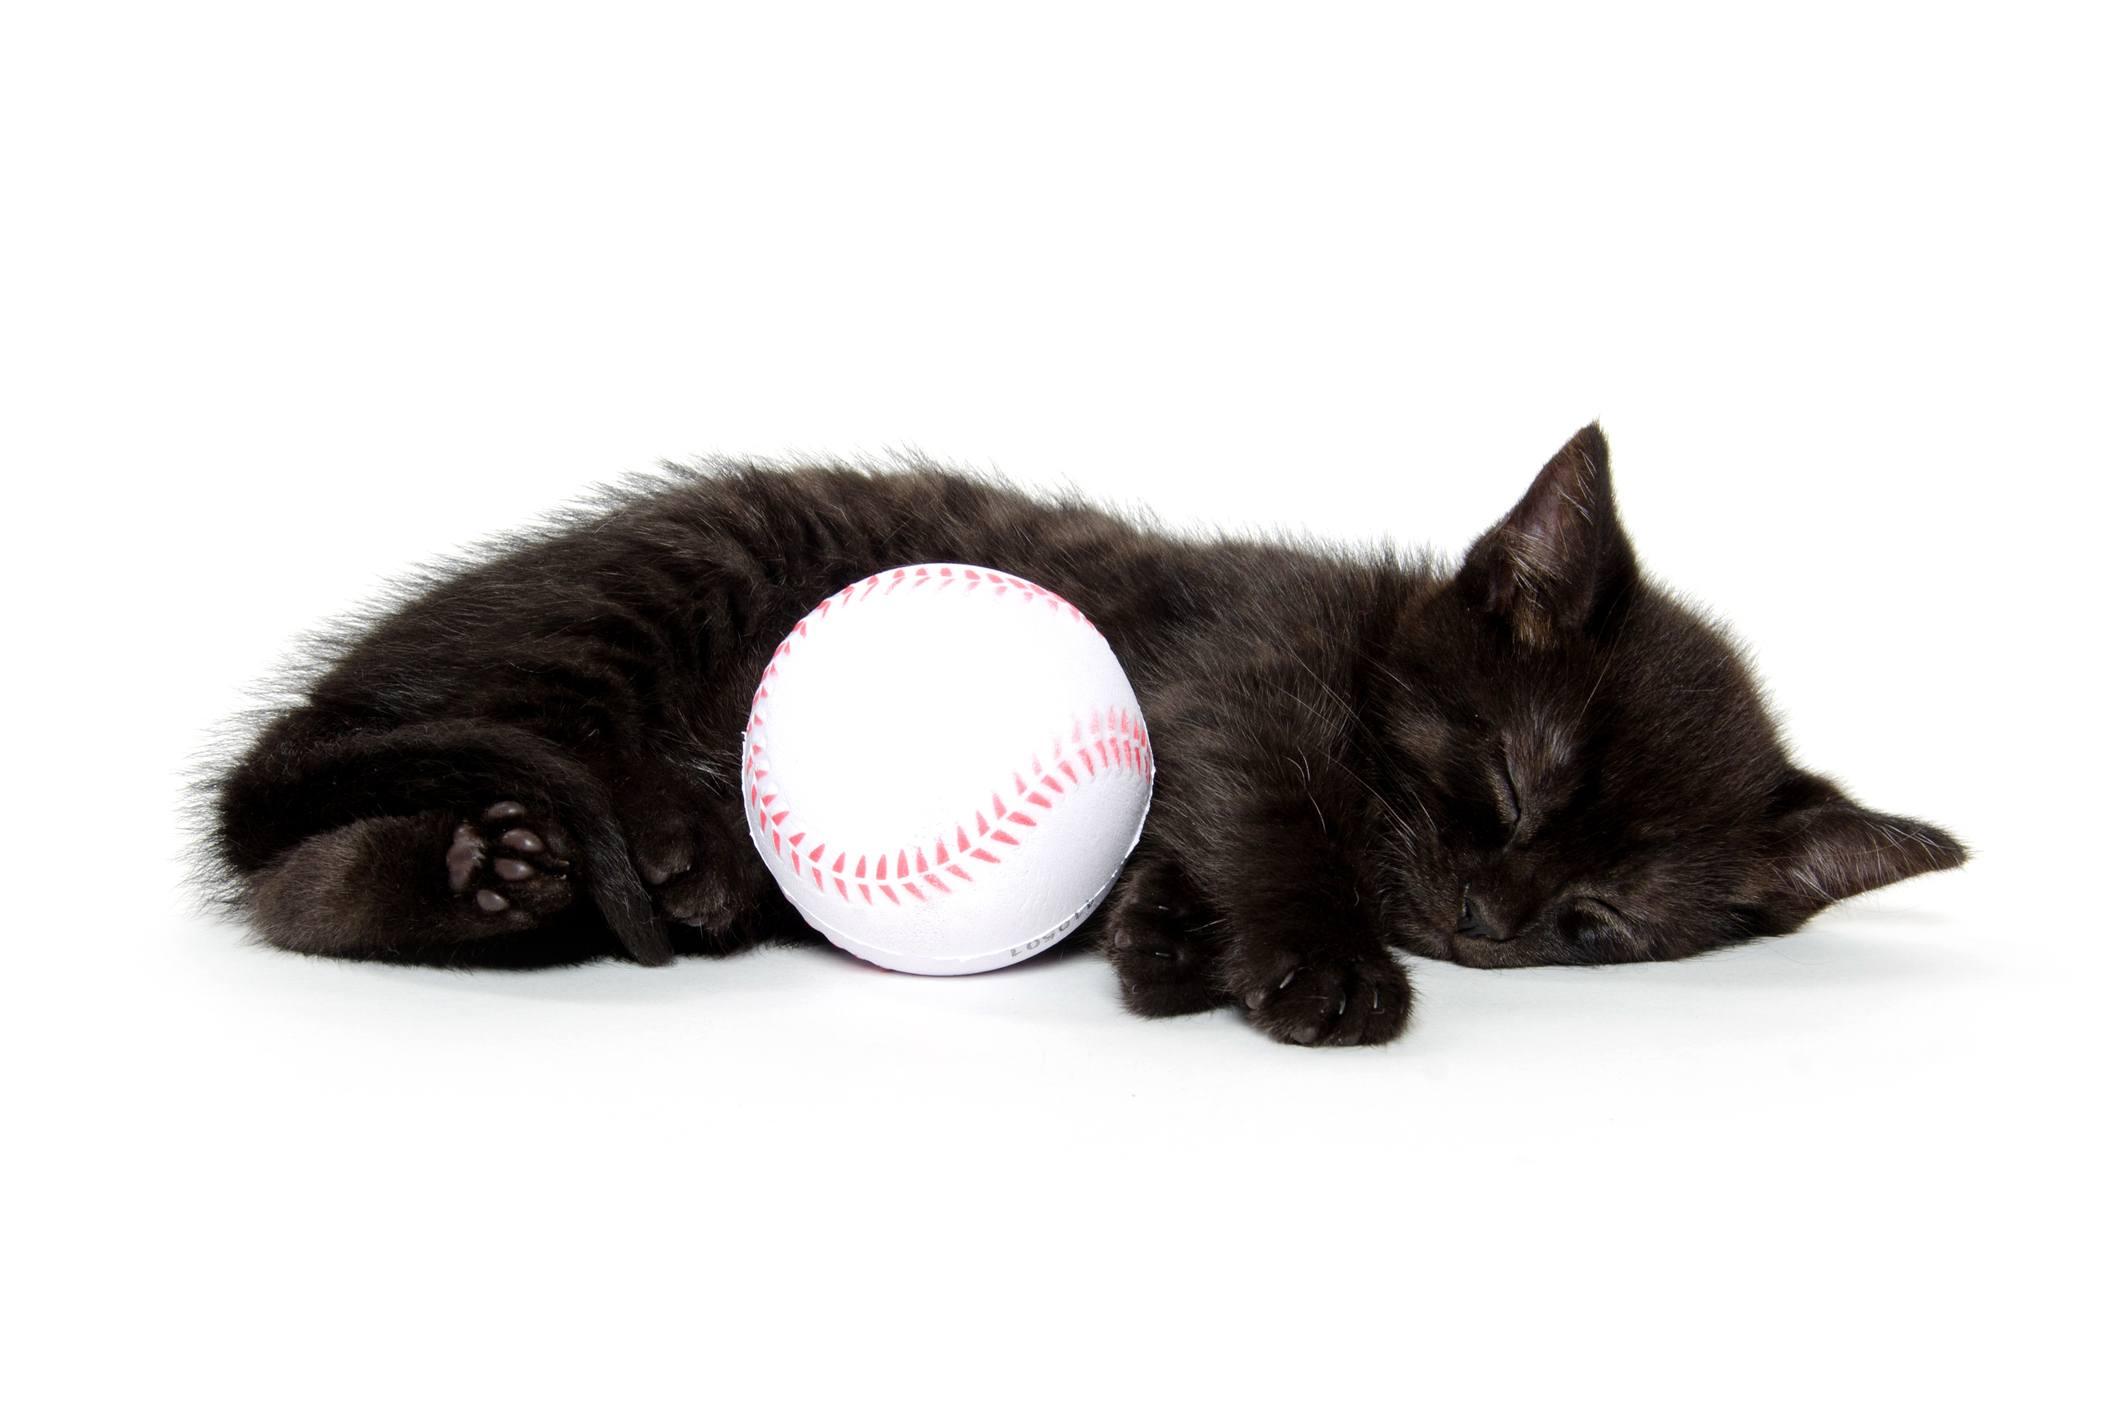 American shorthair black kitten sleeping with baseball